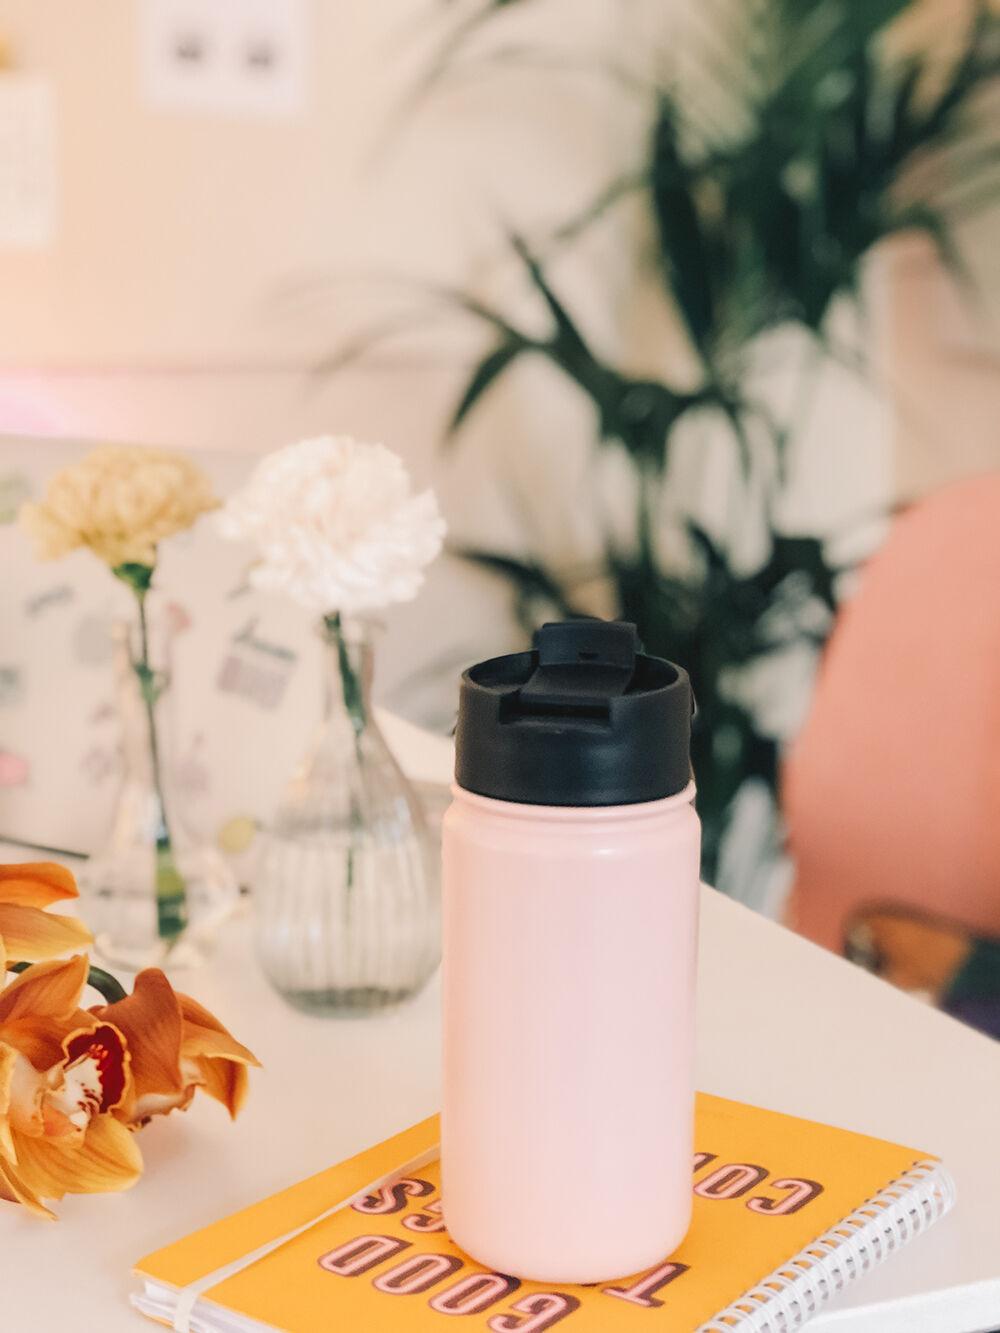 monyay club one cup a million coffees fina stickers hållbar kopp